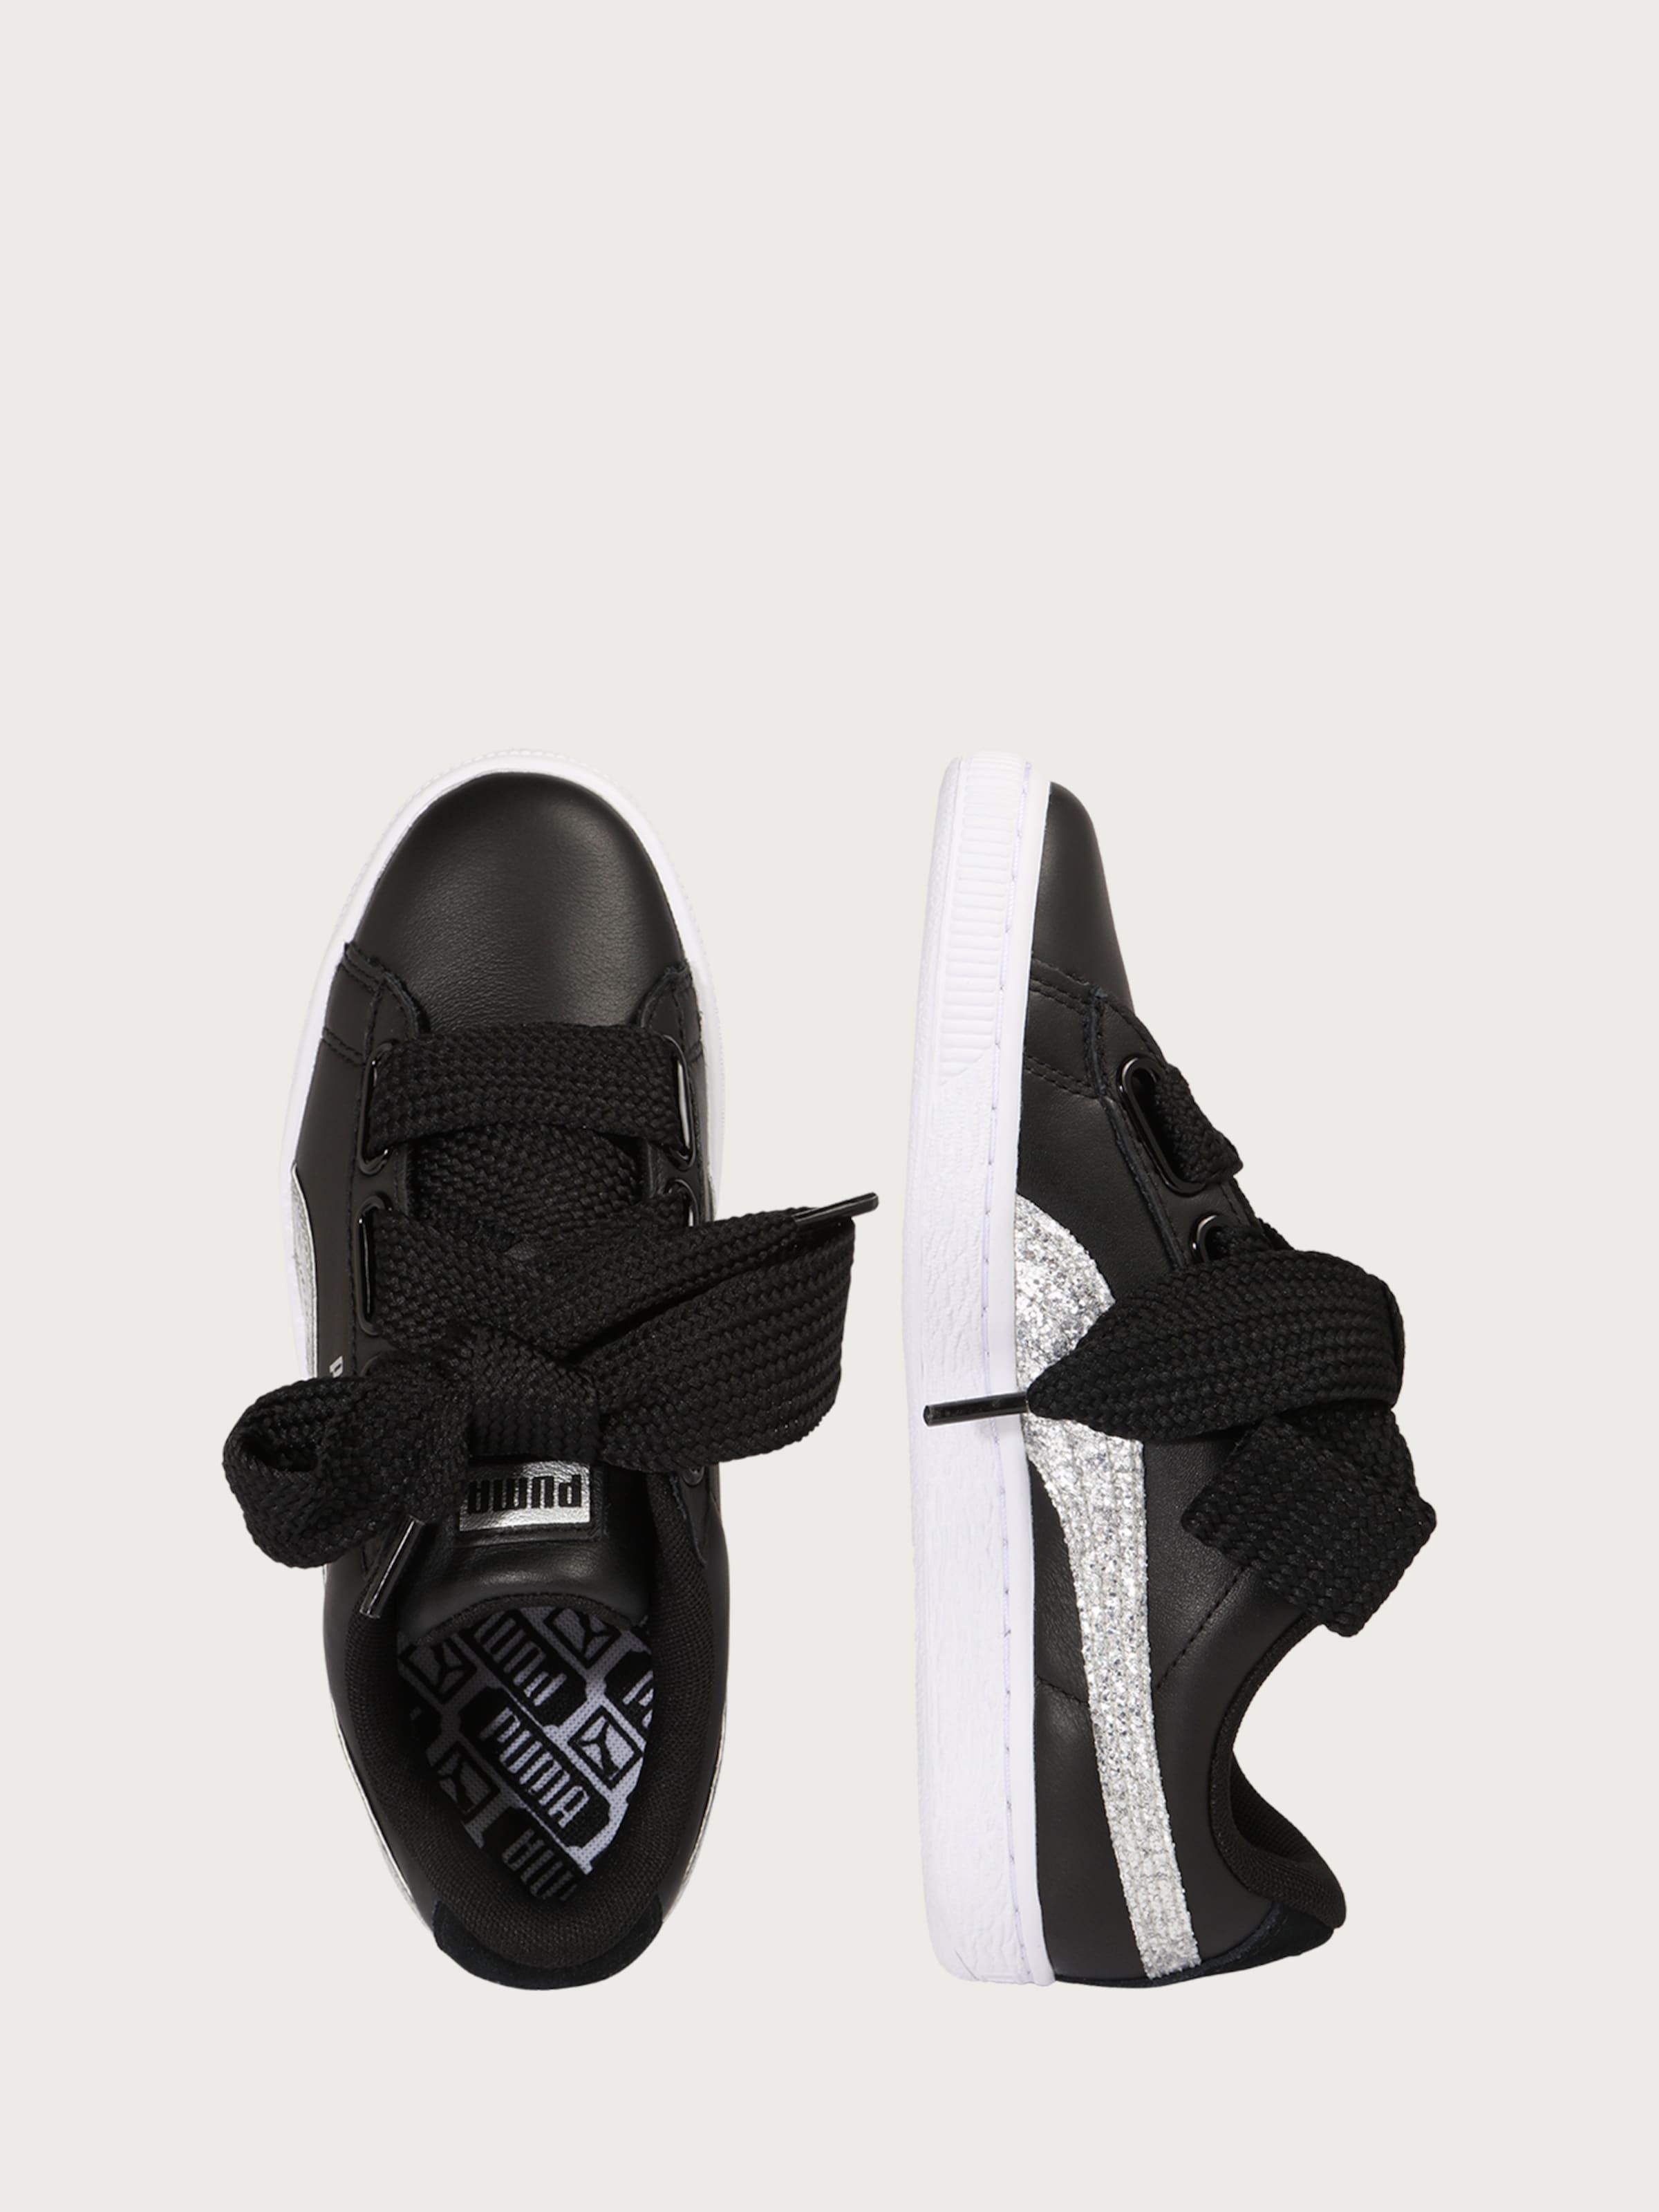 Günstig Kaufen Wahl PUMA Sneaker 'Basket Heart Glitter' Billig Offiziellen Bulk-Design Freies Verschiffen-Spielraum Store xC6dxr5CU6